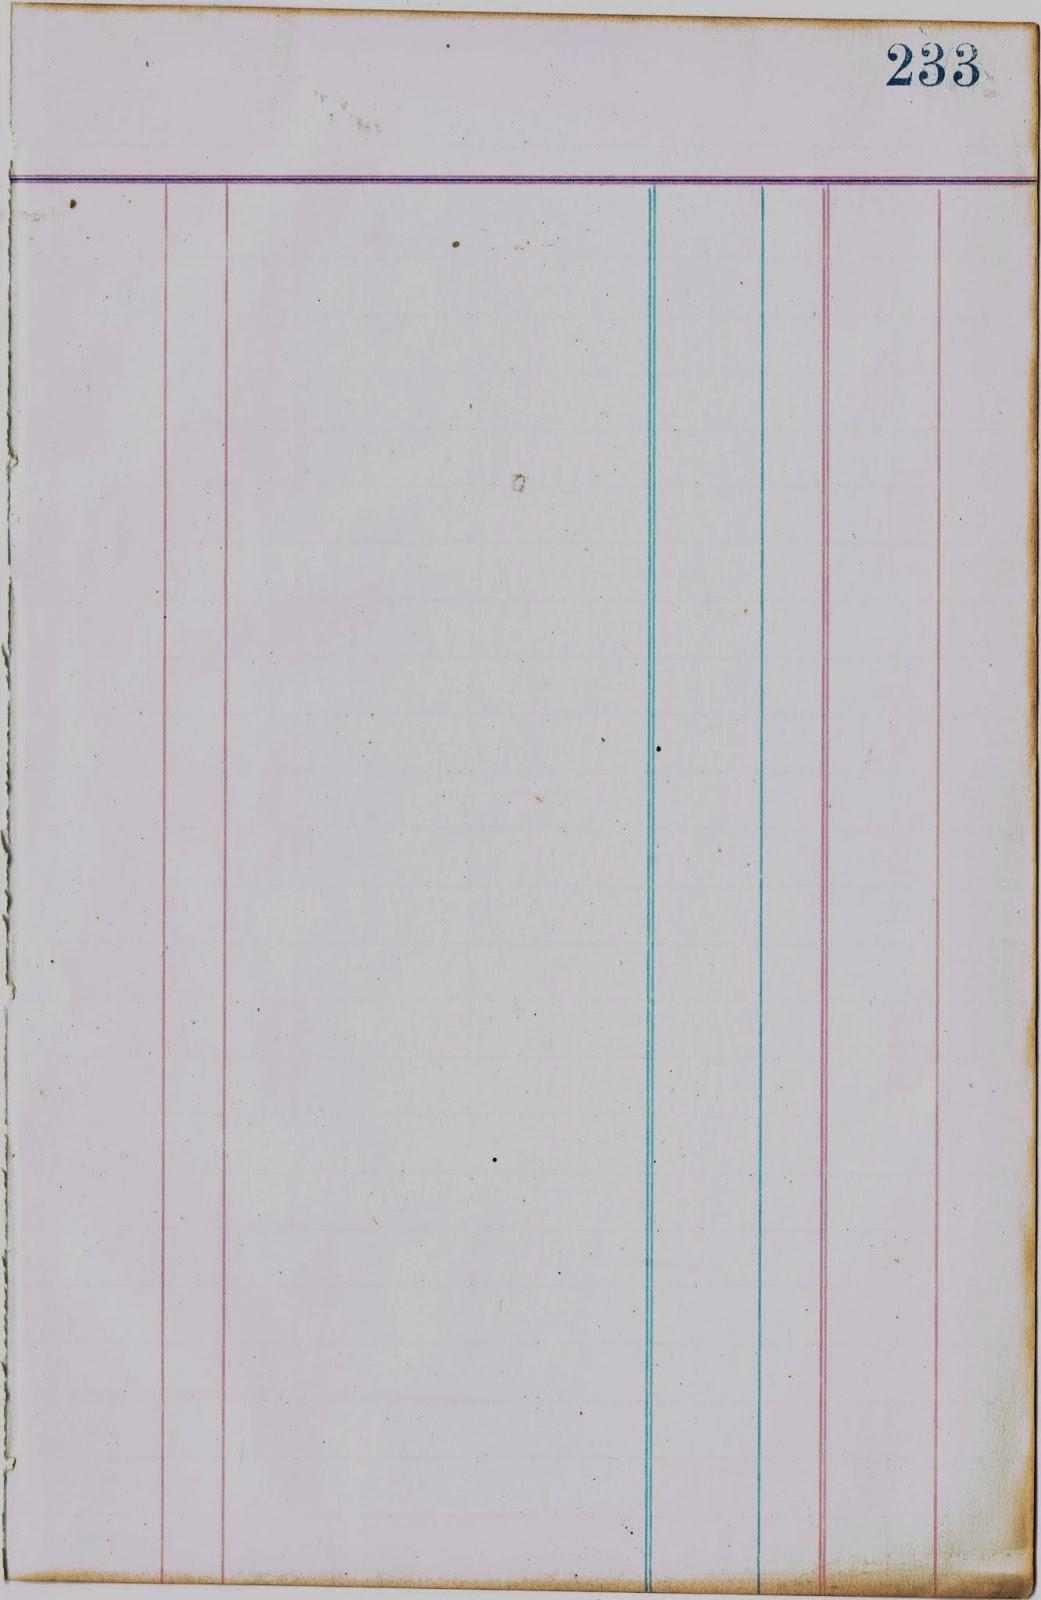 graphic regarding Free Printable Ledger Paper named 8 Blank Ledger Paper - Resume Illustrations Resume Template